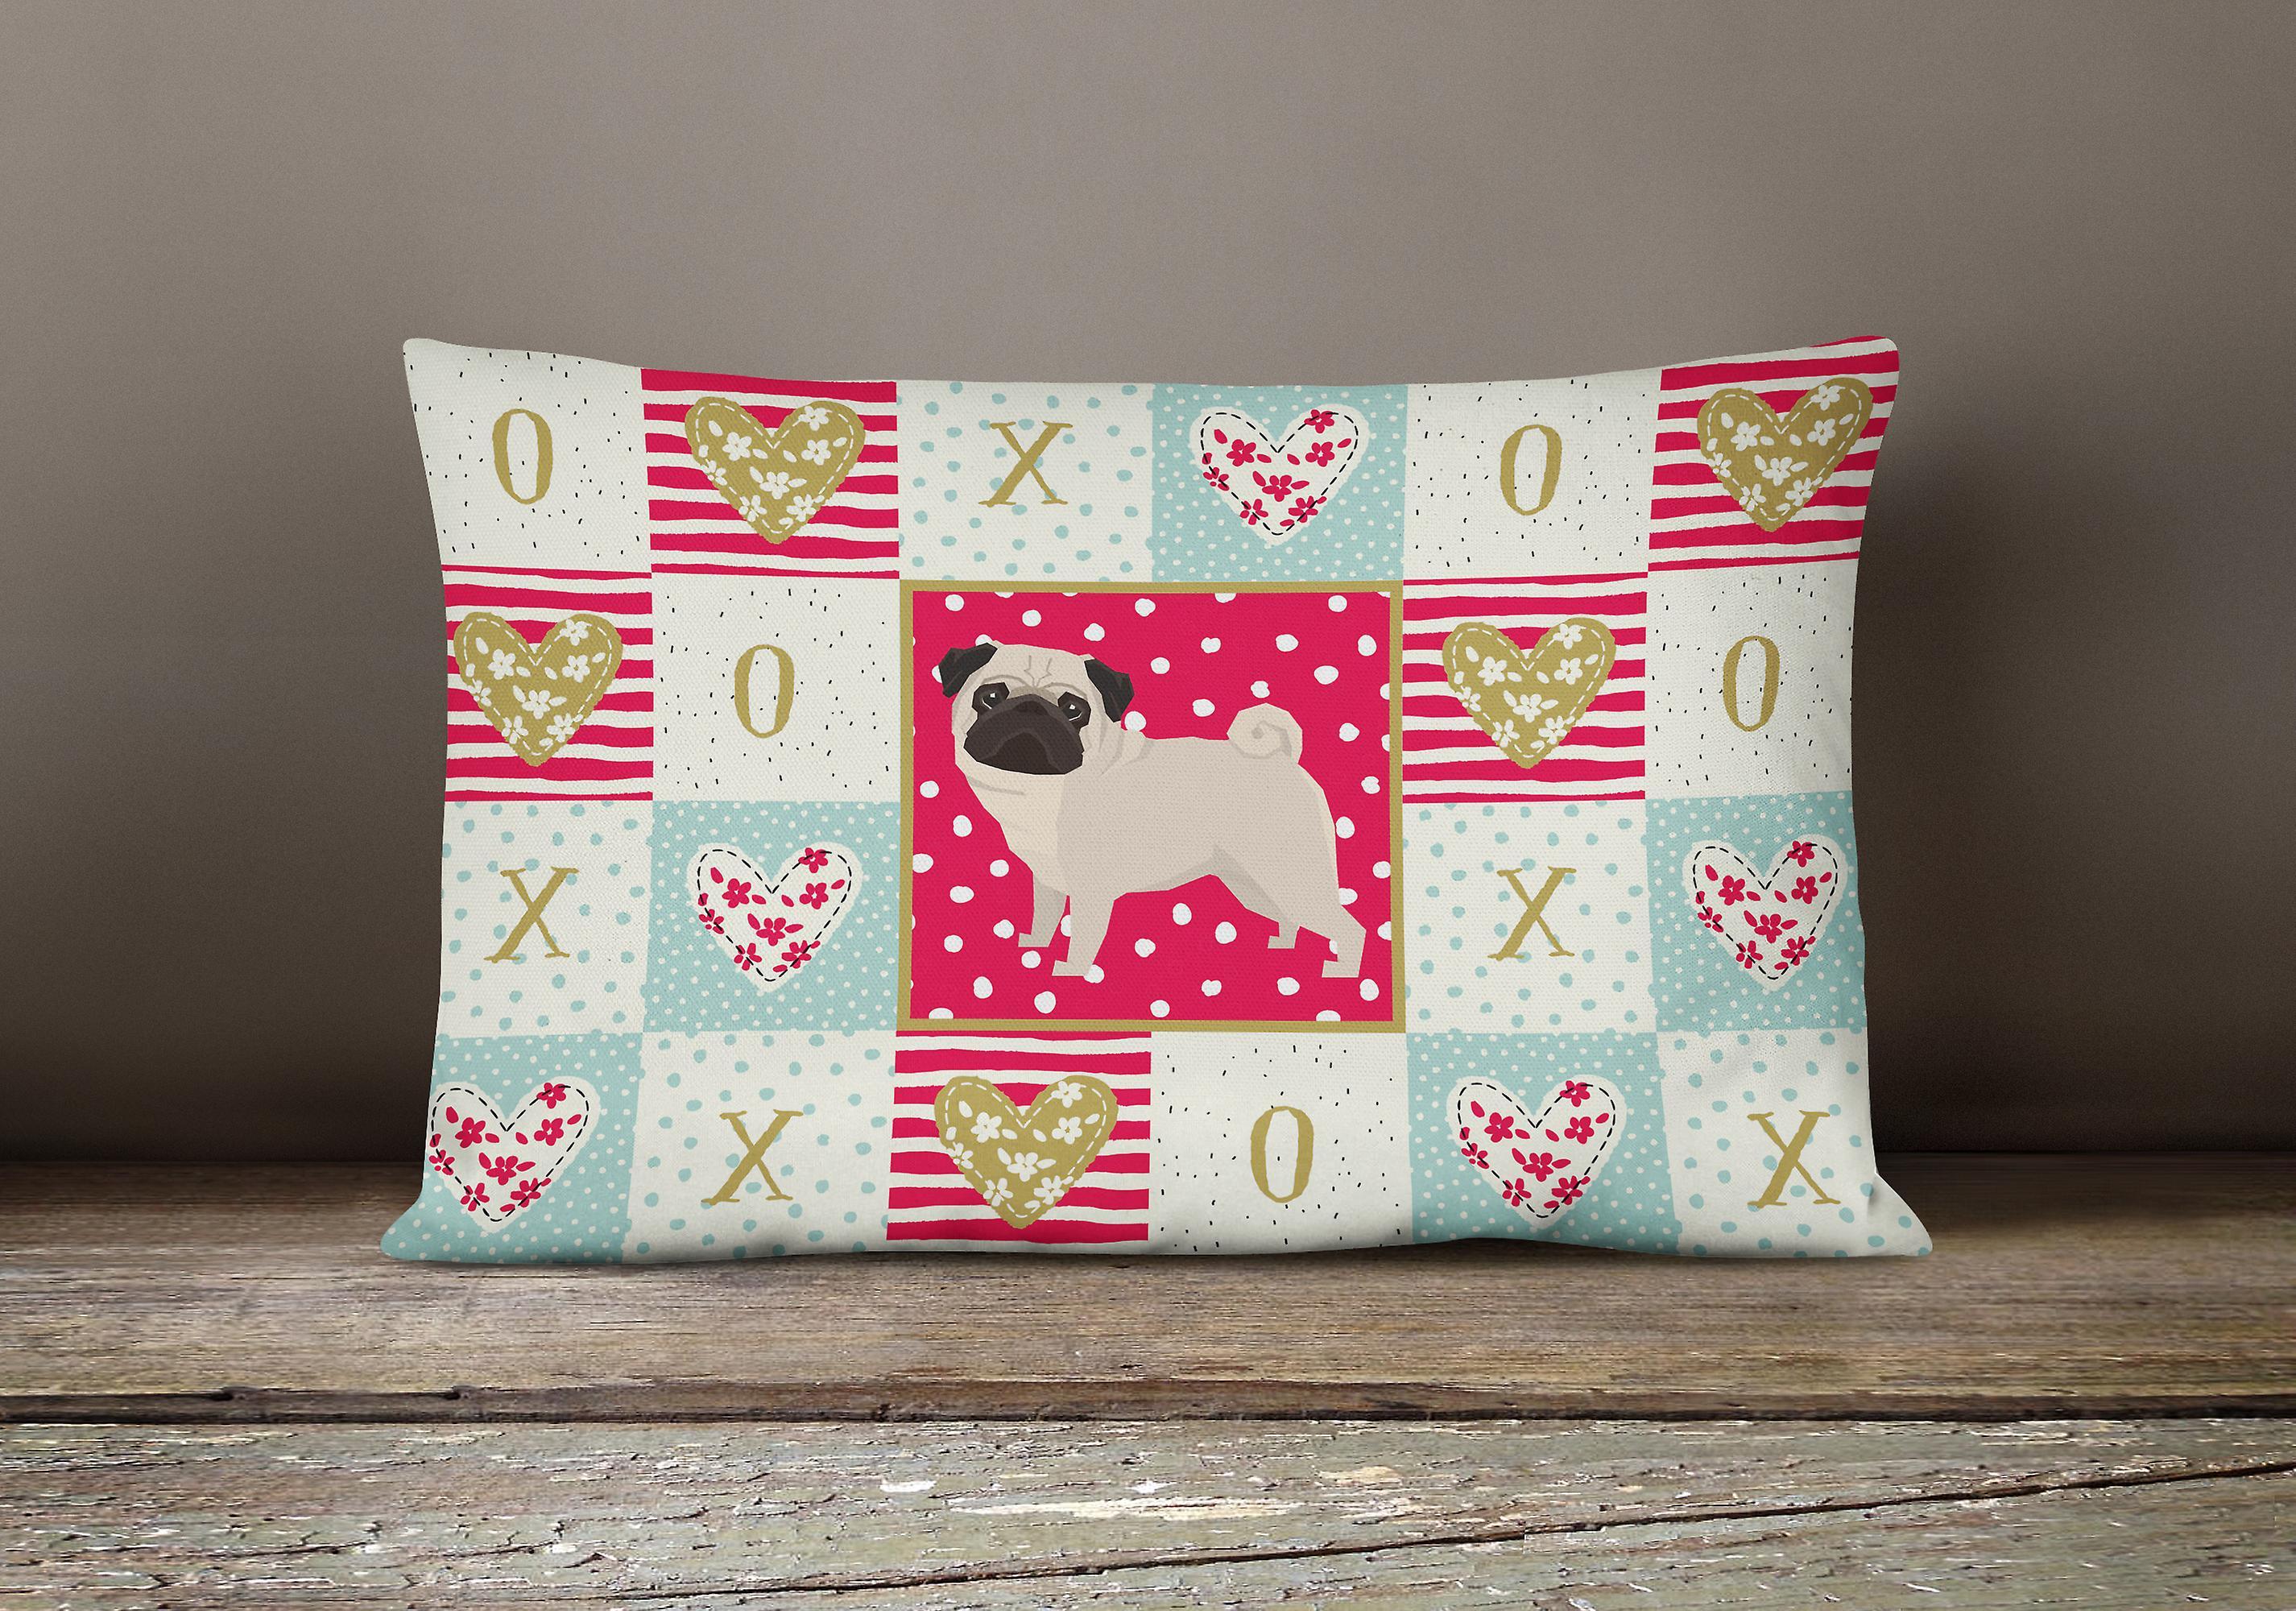 Carolines Treasures  CK5947PW1216 Pug Love Canvas Fabric Decorative Pillow - Dégagement 7s4Mu